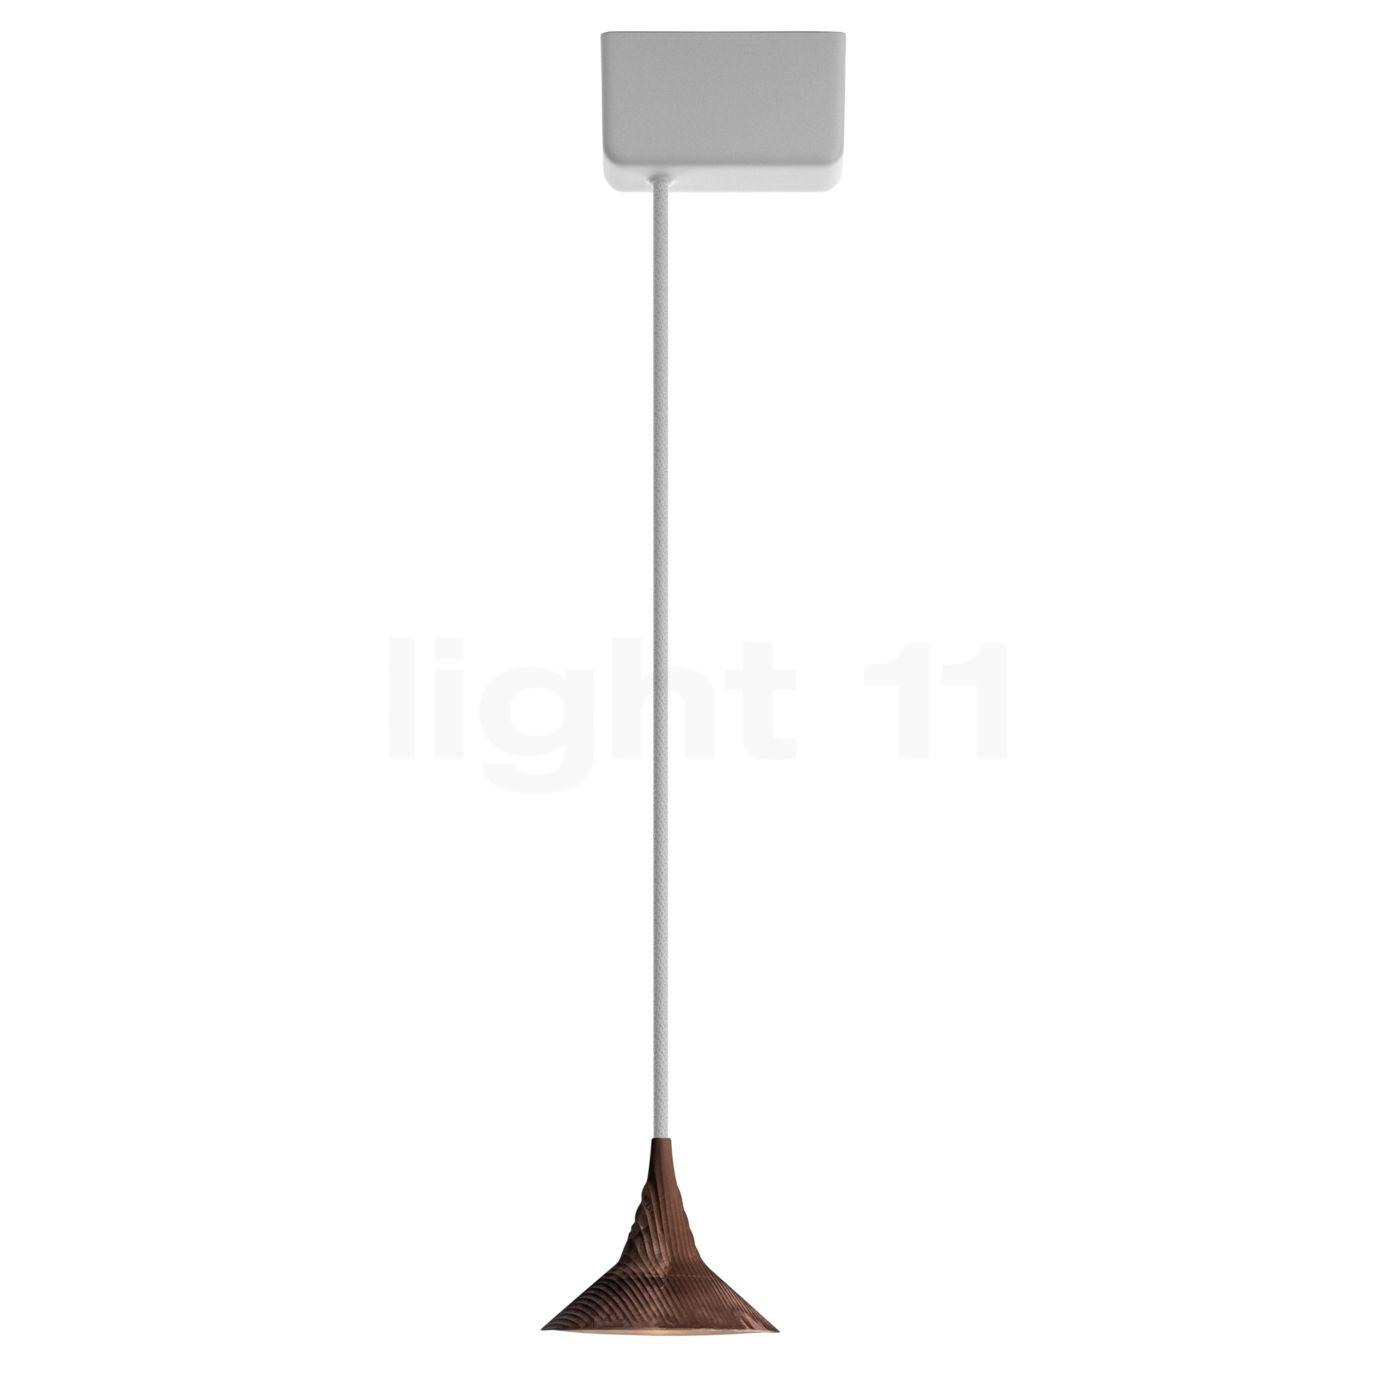 Artemide Unterlinden Sospensione LED, laiton, 3.000 K , Vente d'entrepôt, neuf, emballage d'origine